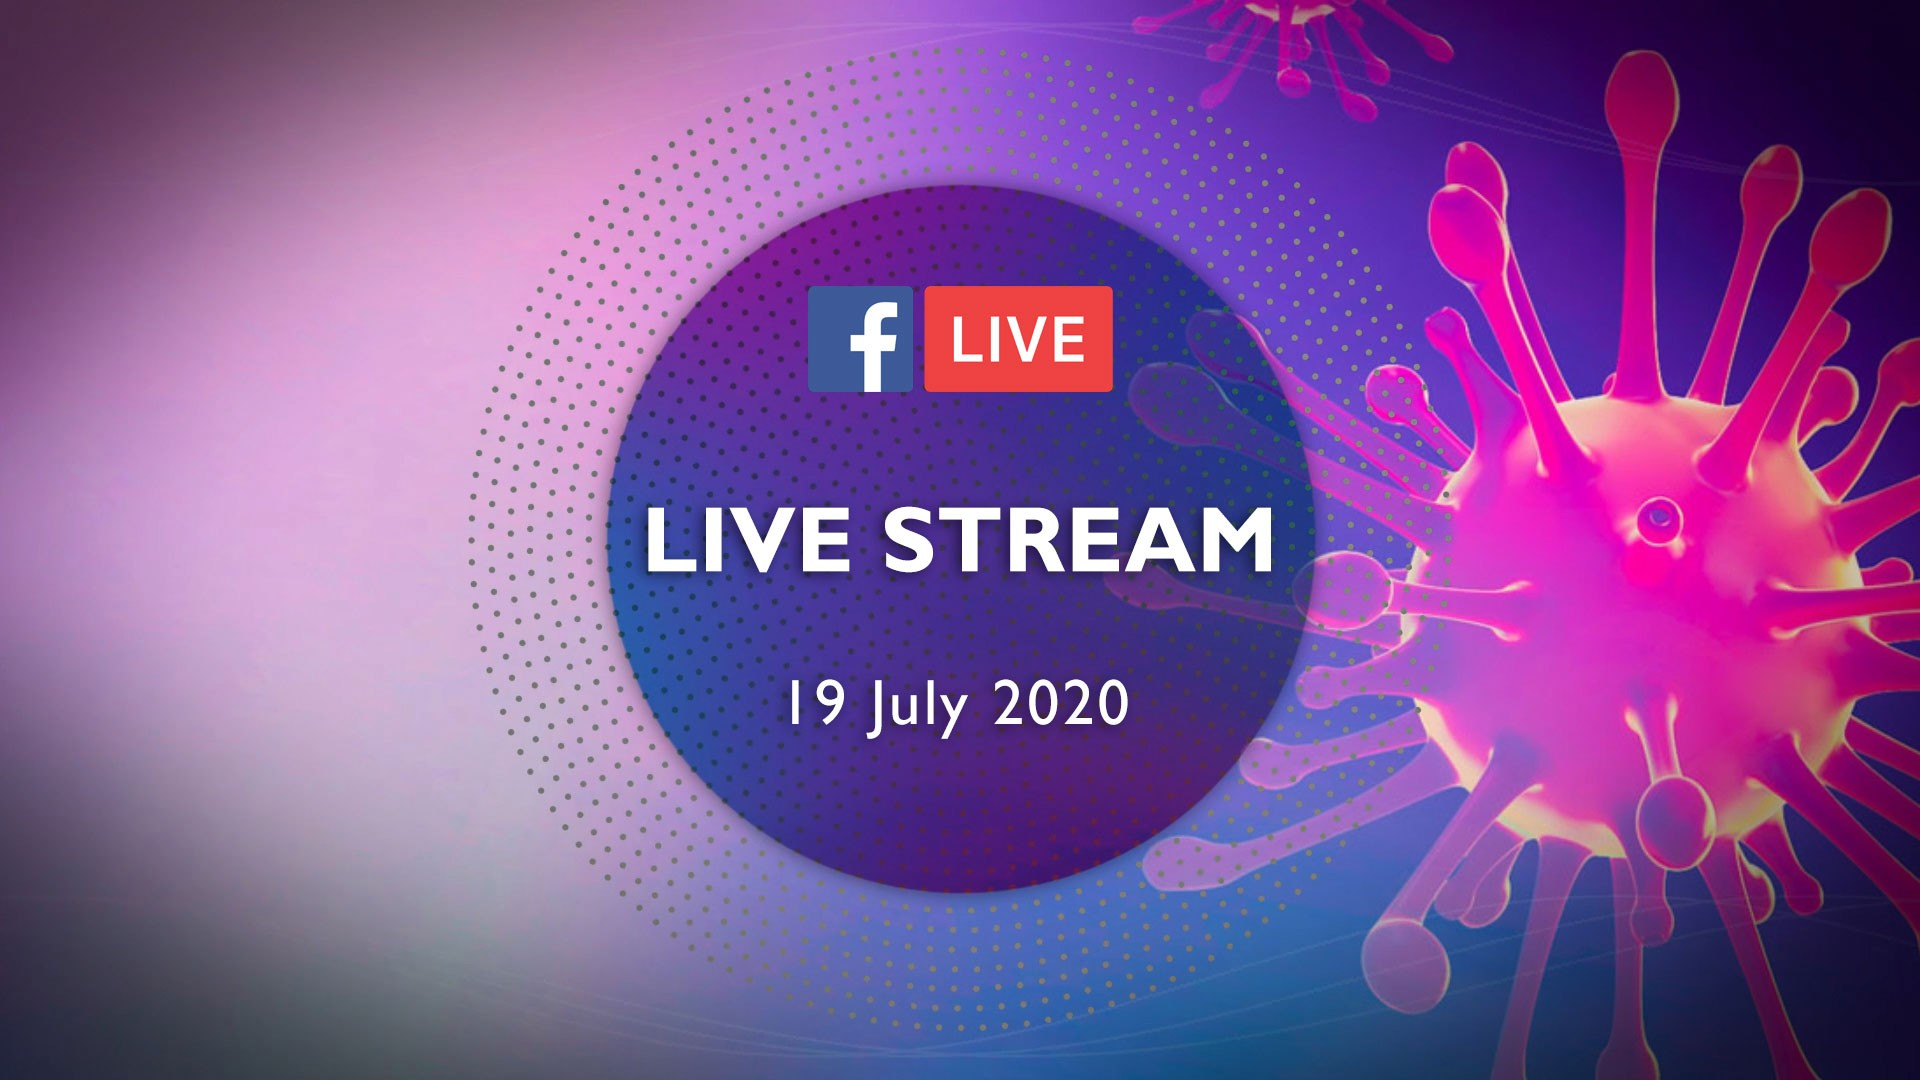 CV-Live-Stream-19th-July-2020-Featl